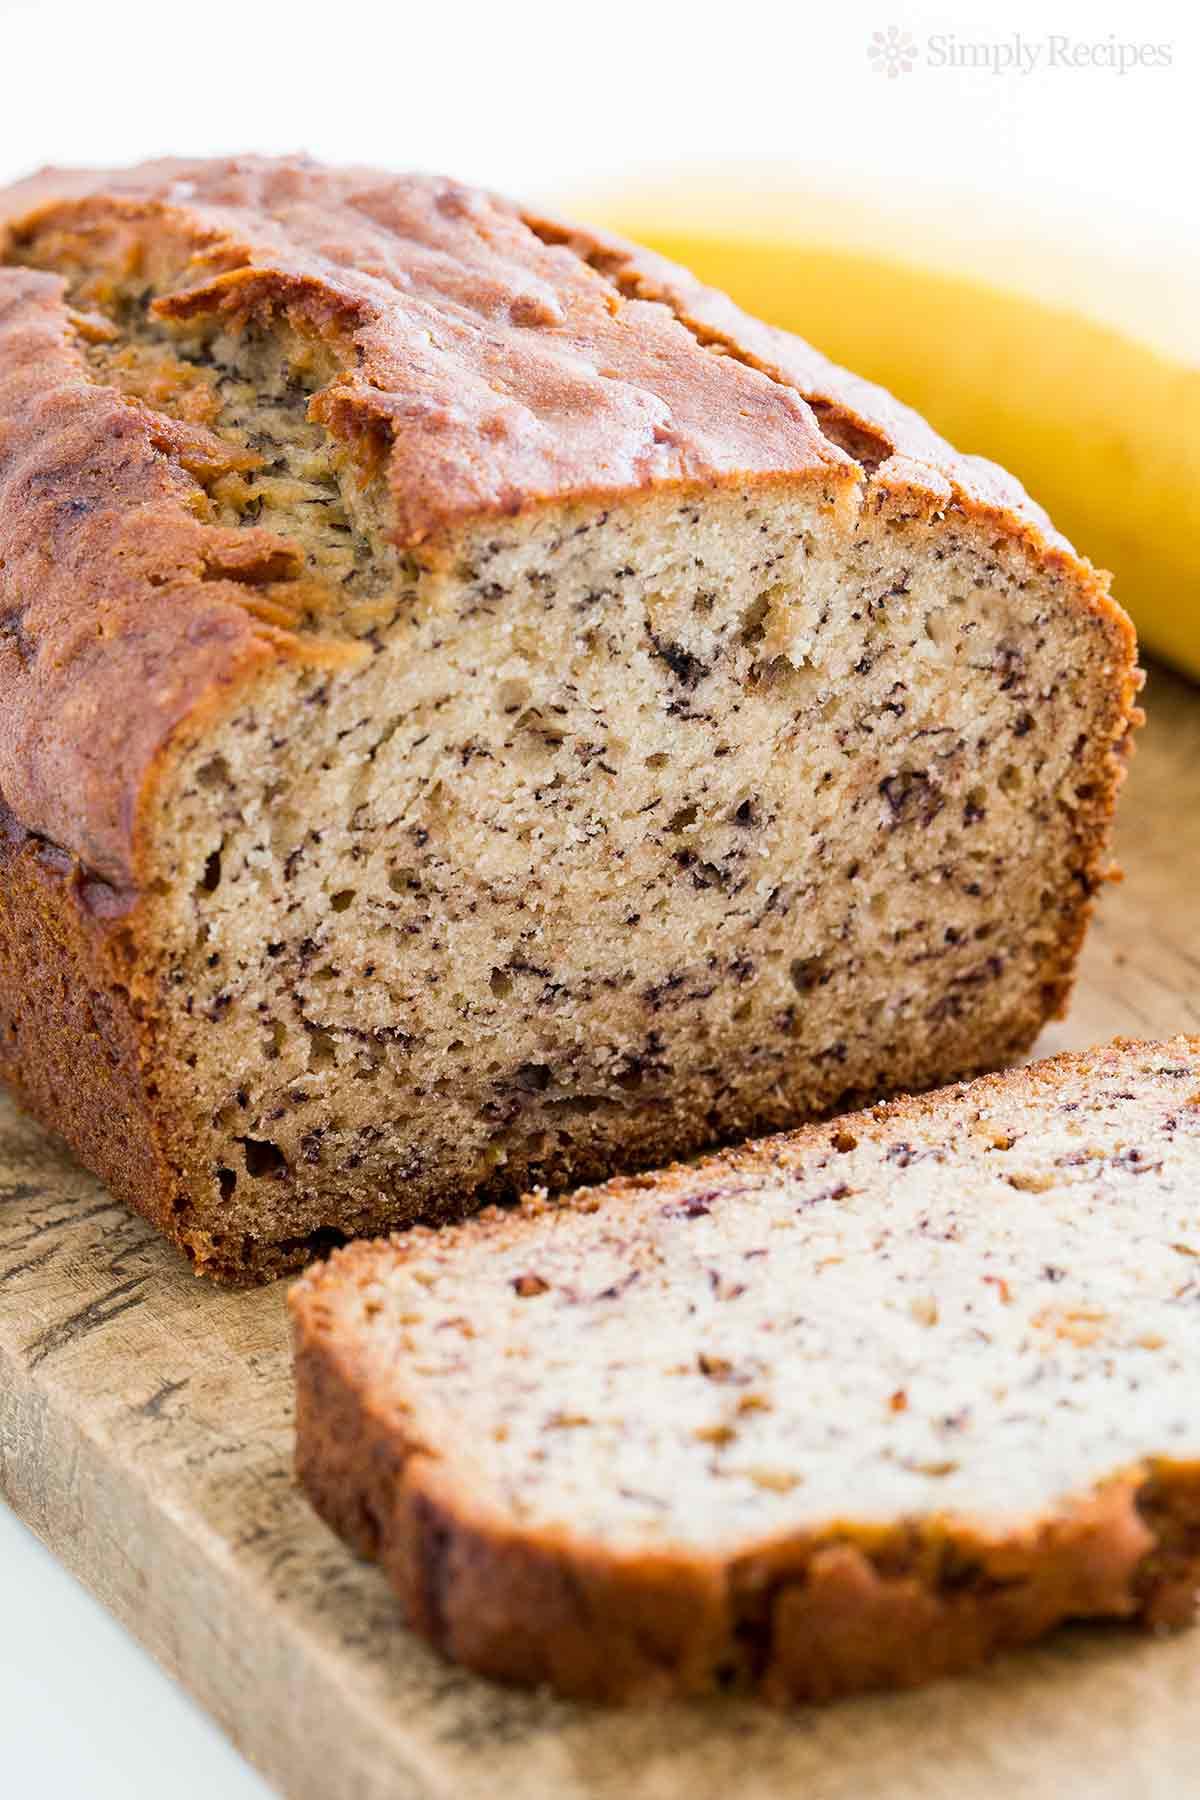 Banana bread recipe with video simplyrecipes forumfinder Gallery